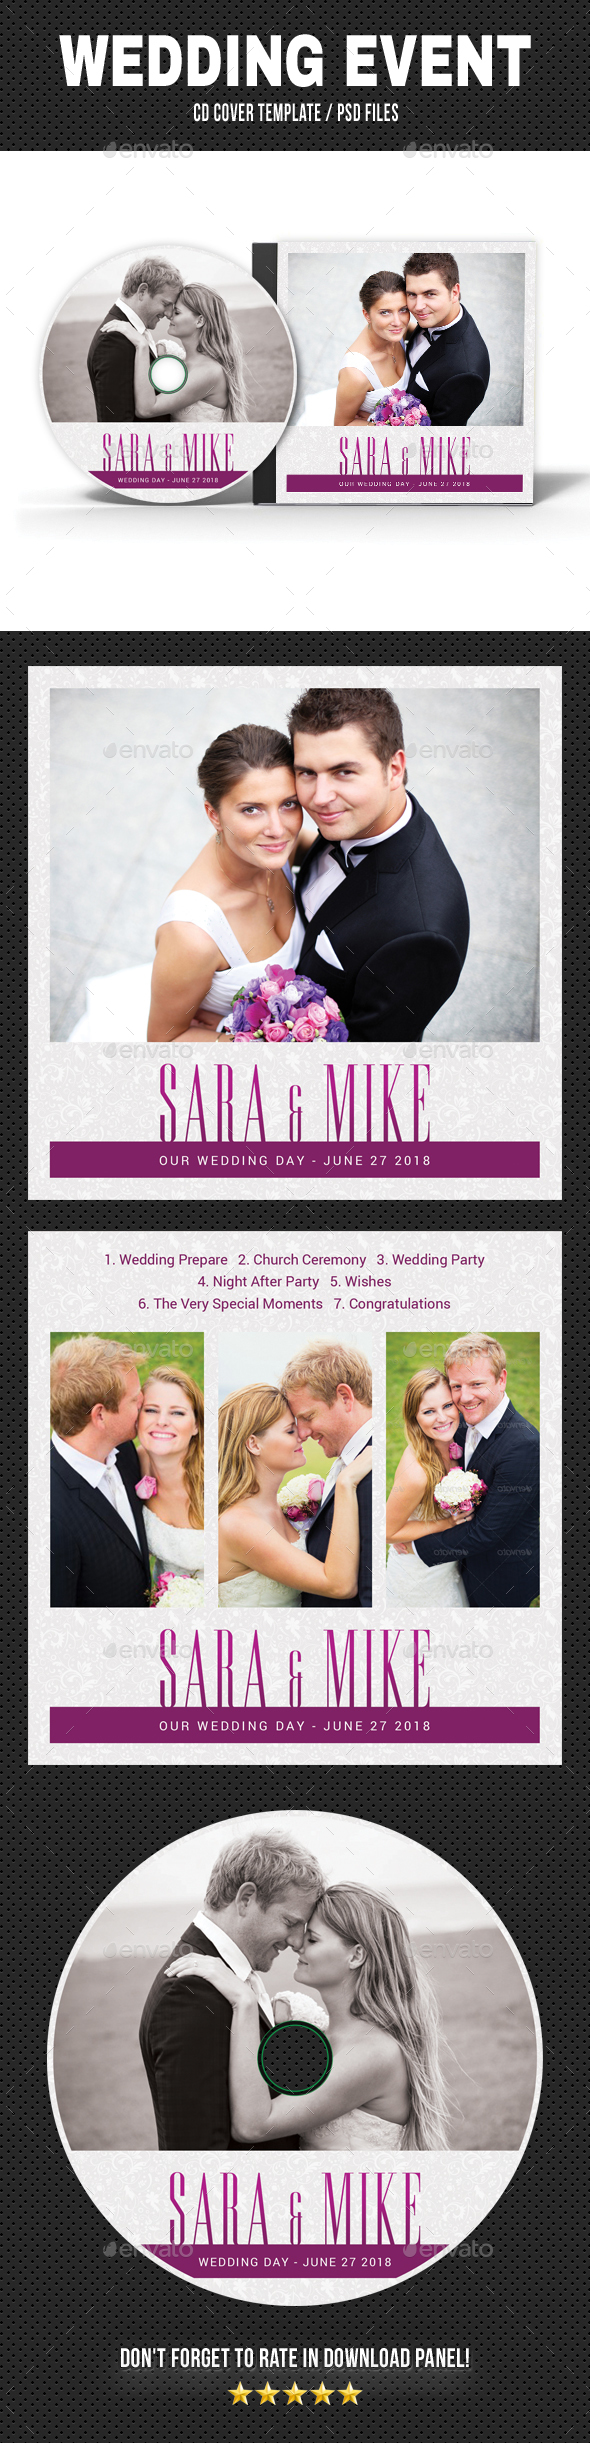 Wedding Event CD Cover v23 - CD & DVD Artwork Print Templates